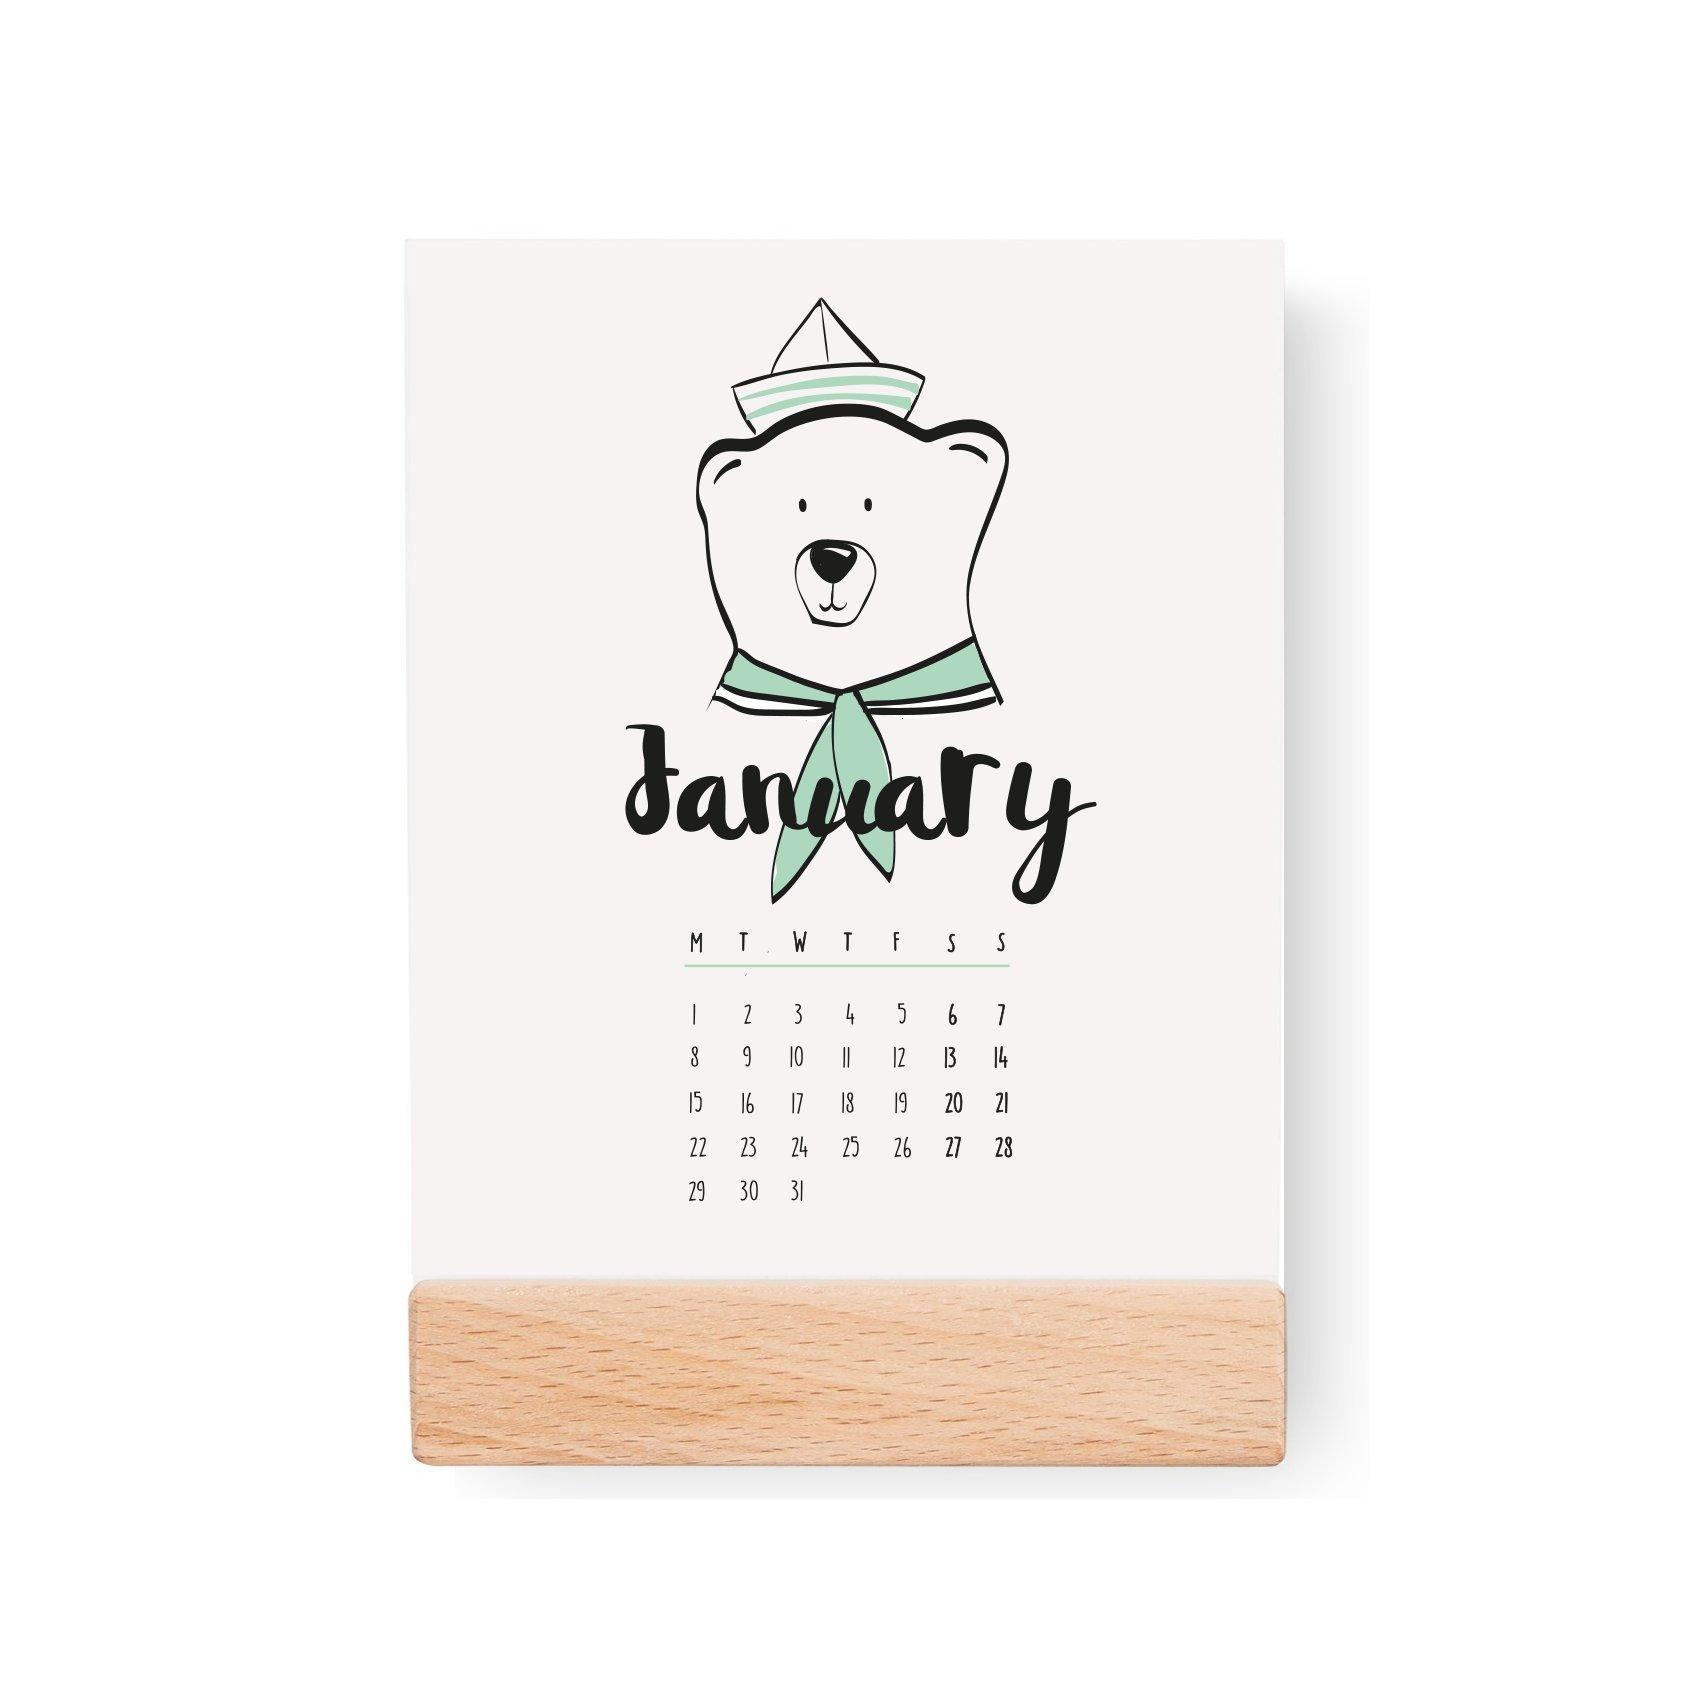 2018 Desktop Kids Calendar, Nursery Calendar, 2018 Calendar, Colorful Calendar, Card Stock Paper, Modern Calendar, Christmas Gift Idea by Lovely Decor